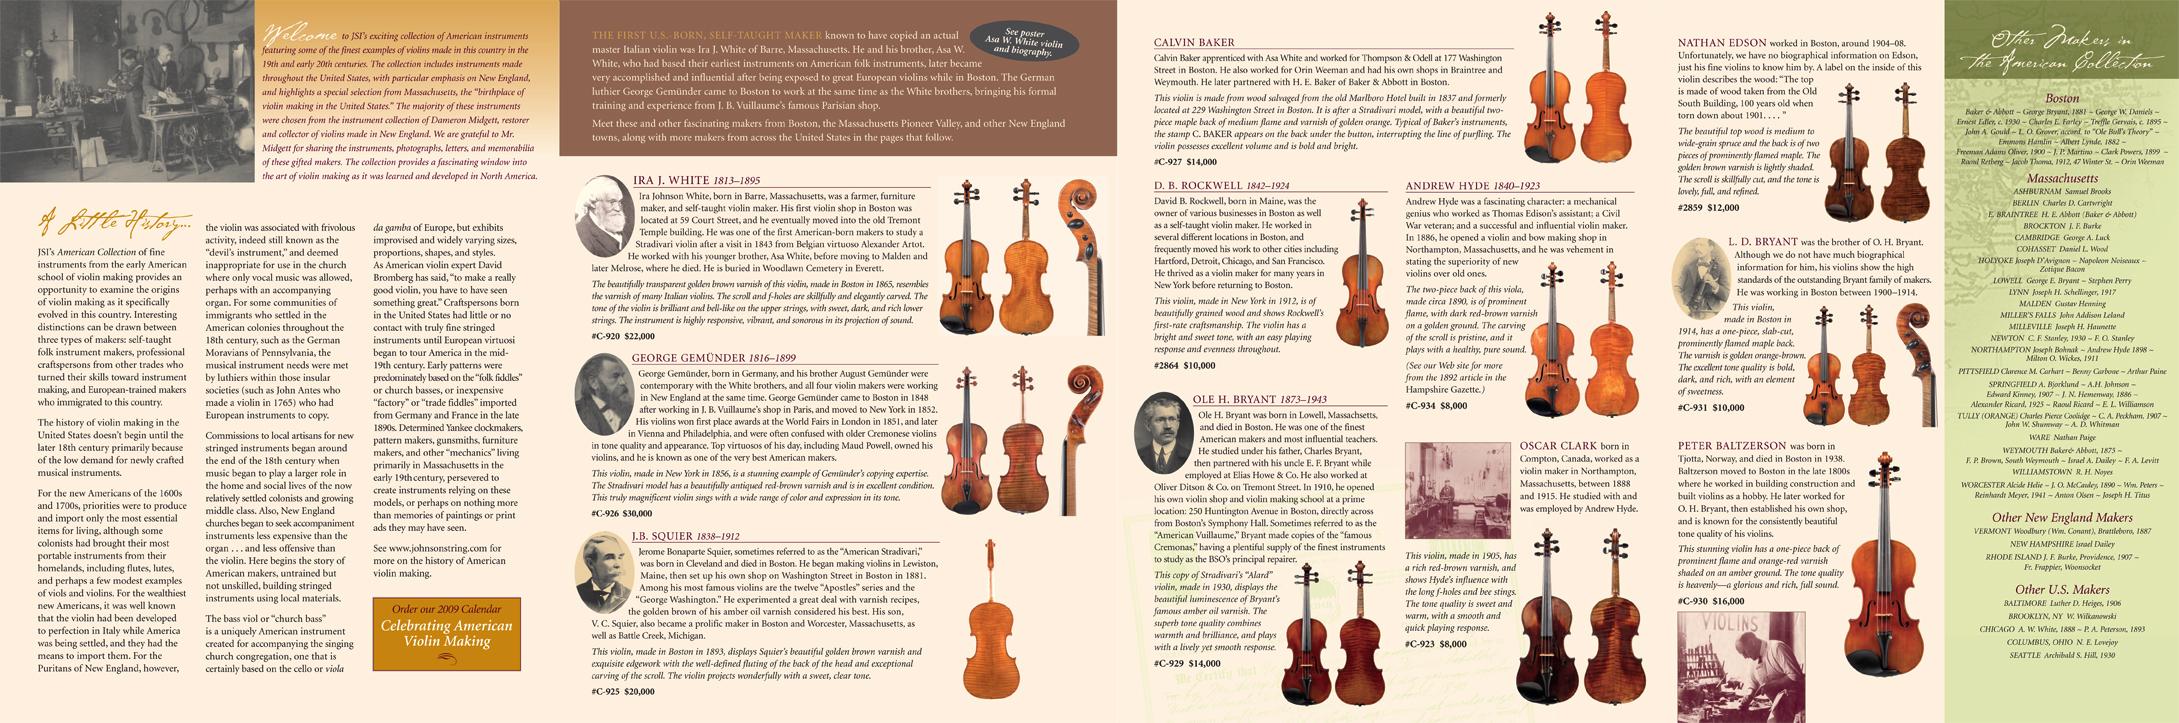 Johnson String Instrument